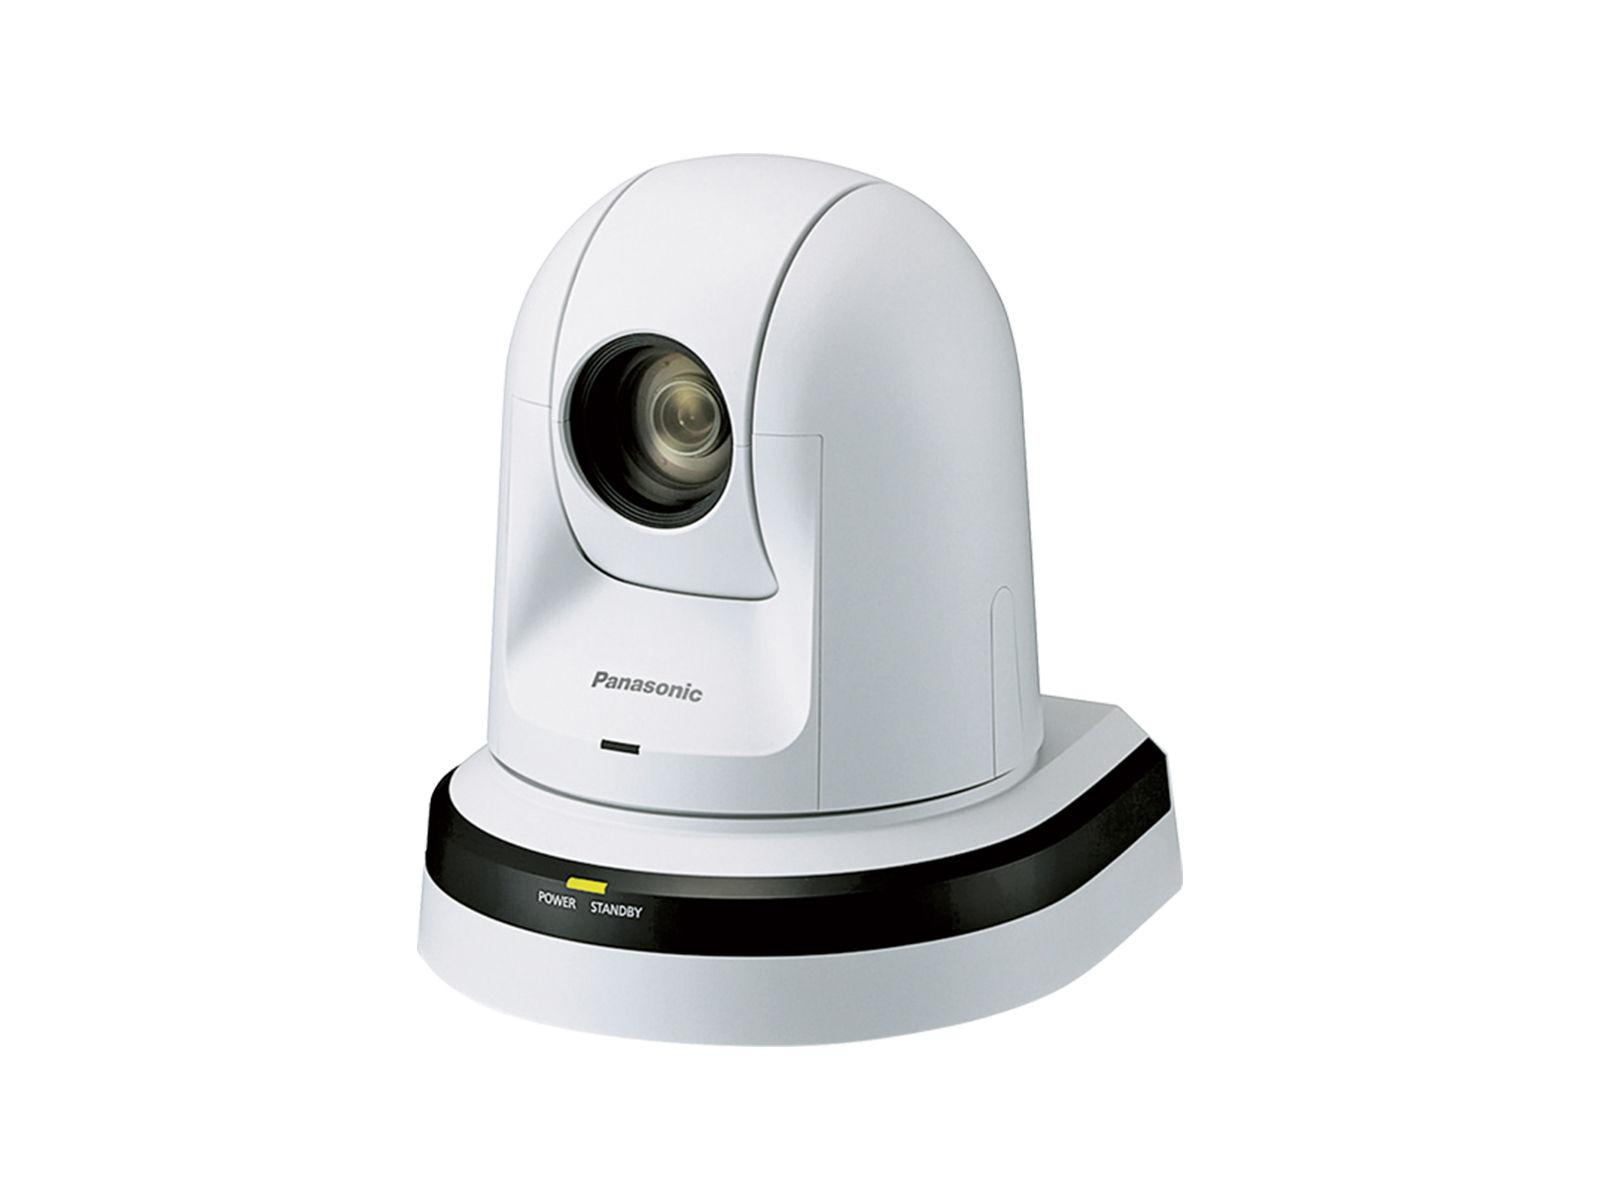 Panasonic AW-HN40HWEJ | HD-Kamera, PTZ, HDMI, NDI / HX support, 1/2,3-Typ-MOS, 30fach optischer Zoom, weiss